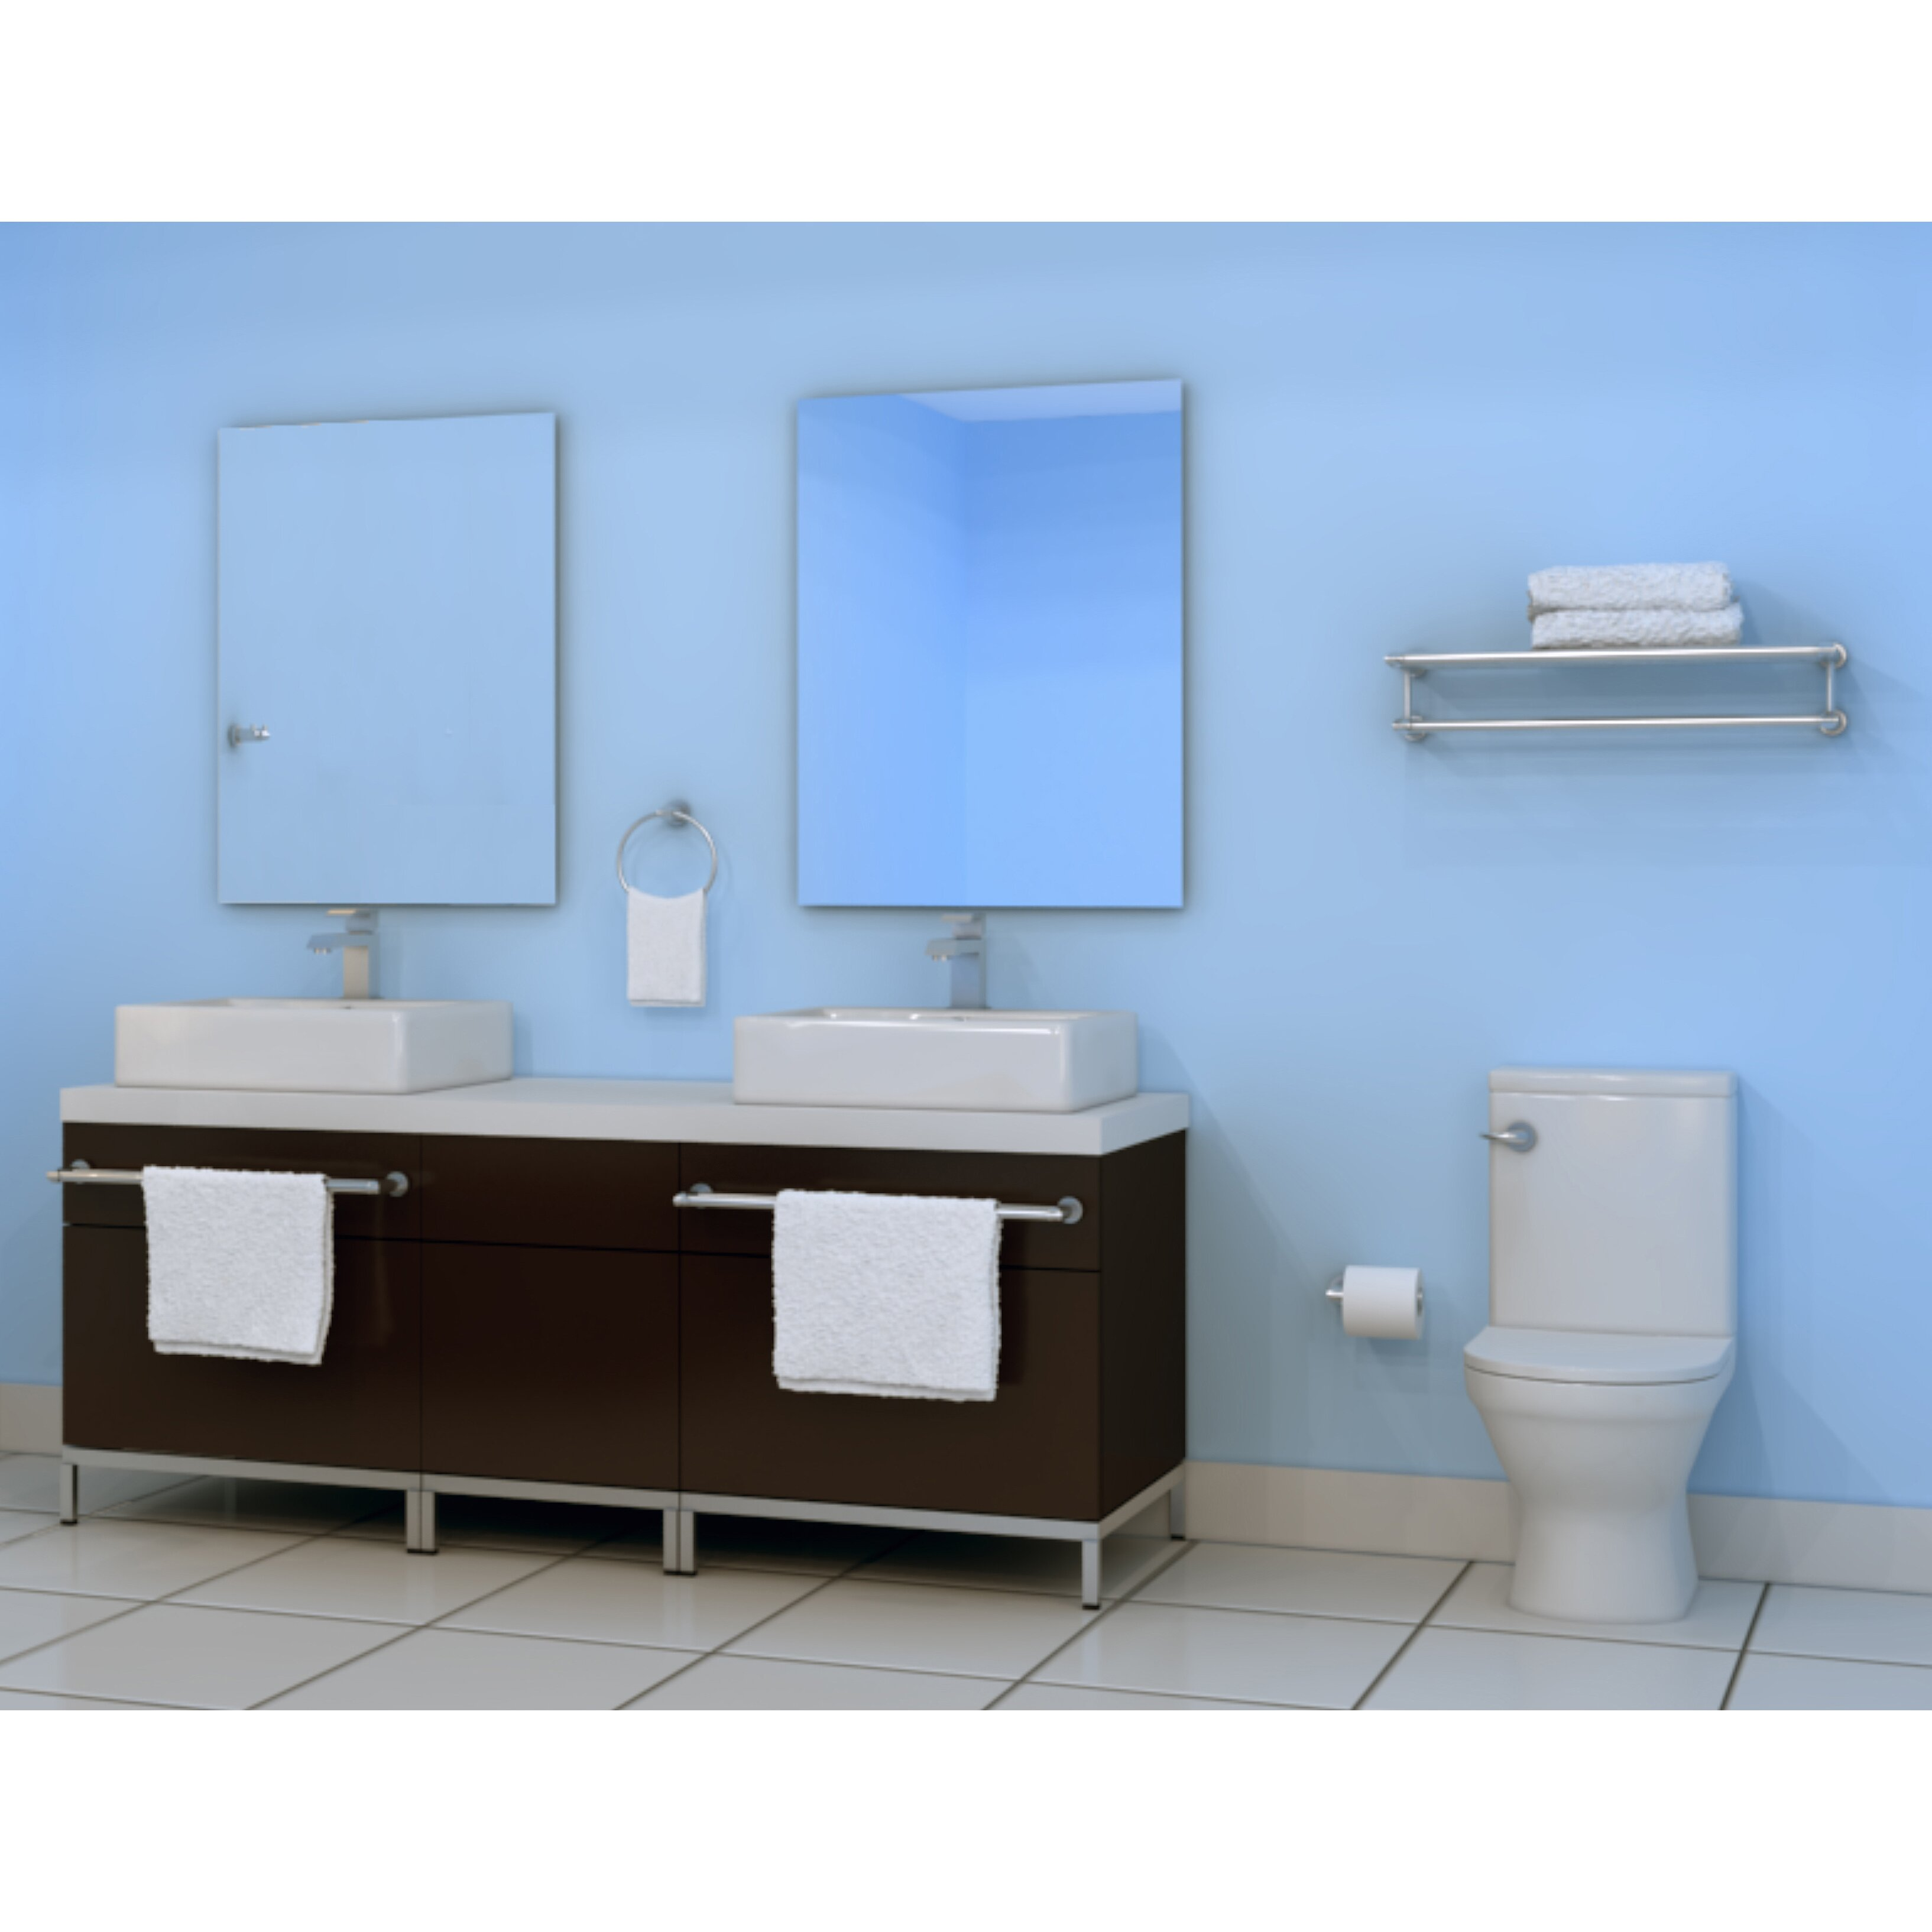 Ancona moderna 4 piece bathroom hardware set wayfair for Bathroom 4 piece set